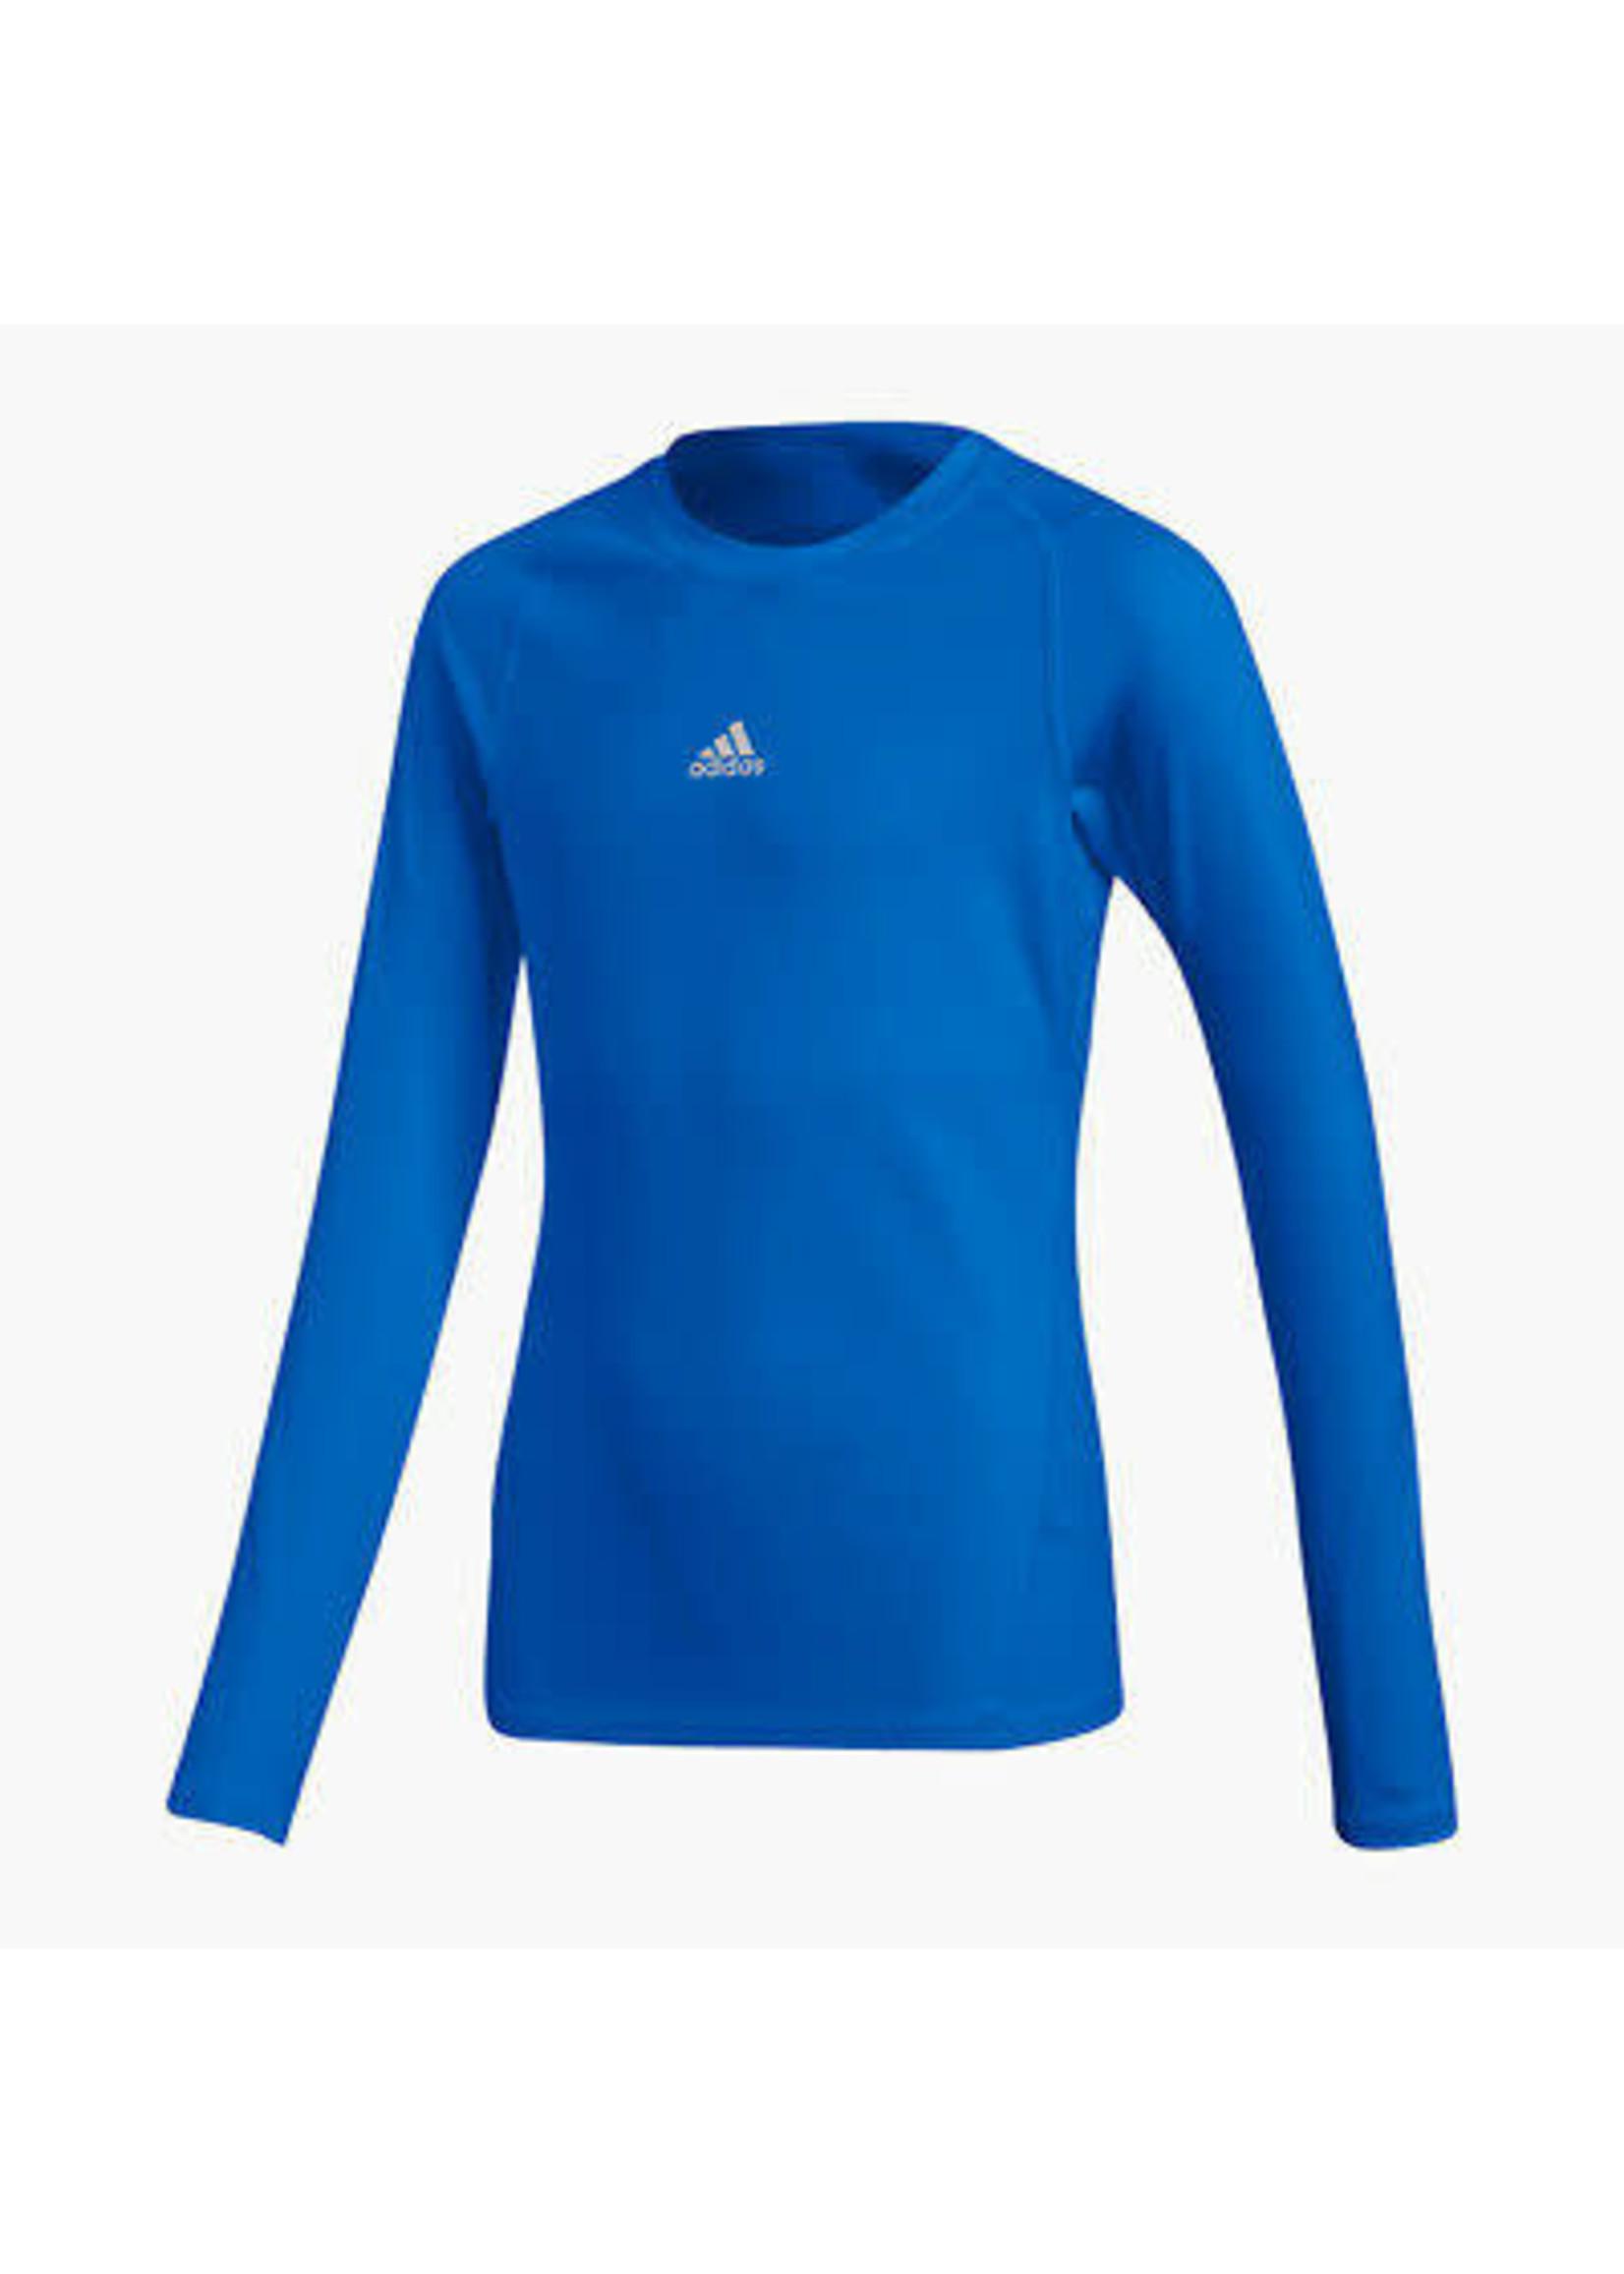 Adidas ADIDAS COMPRESSION SHIRT ASK SPRT LST M